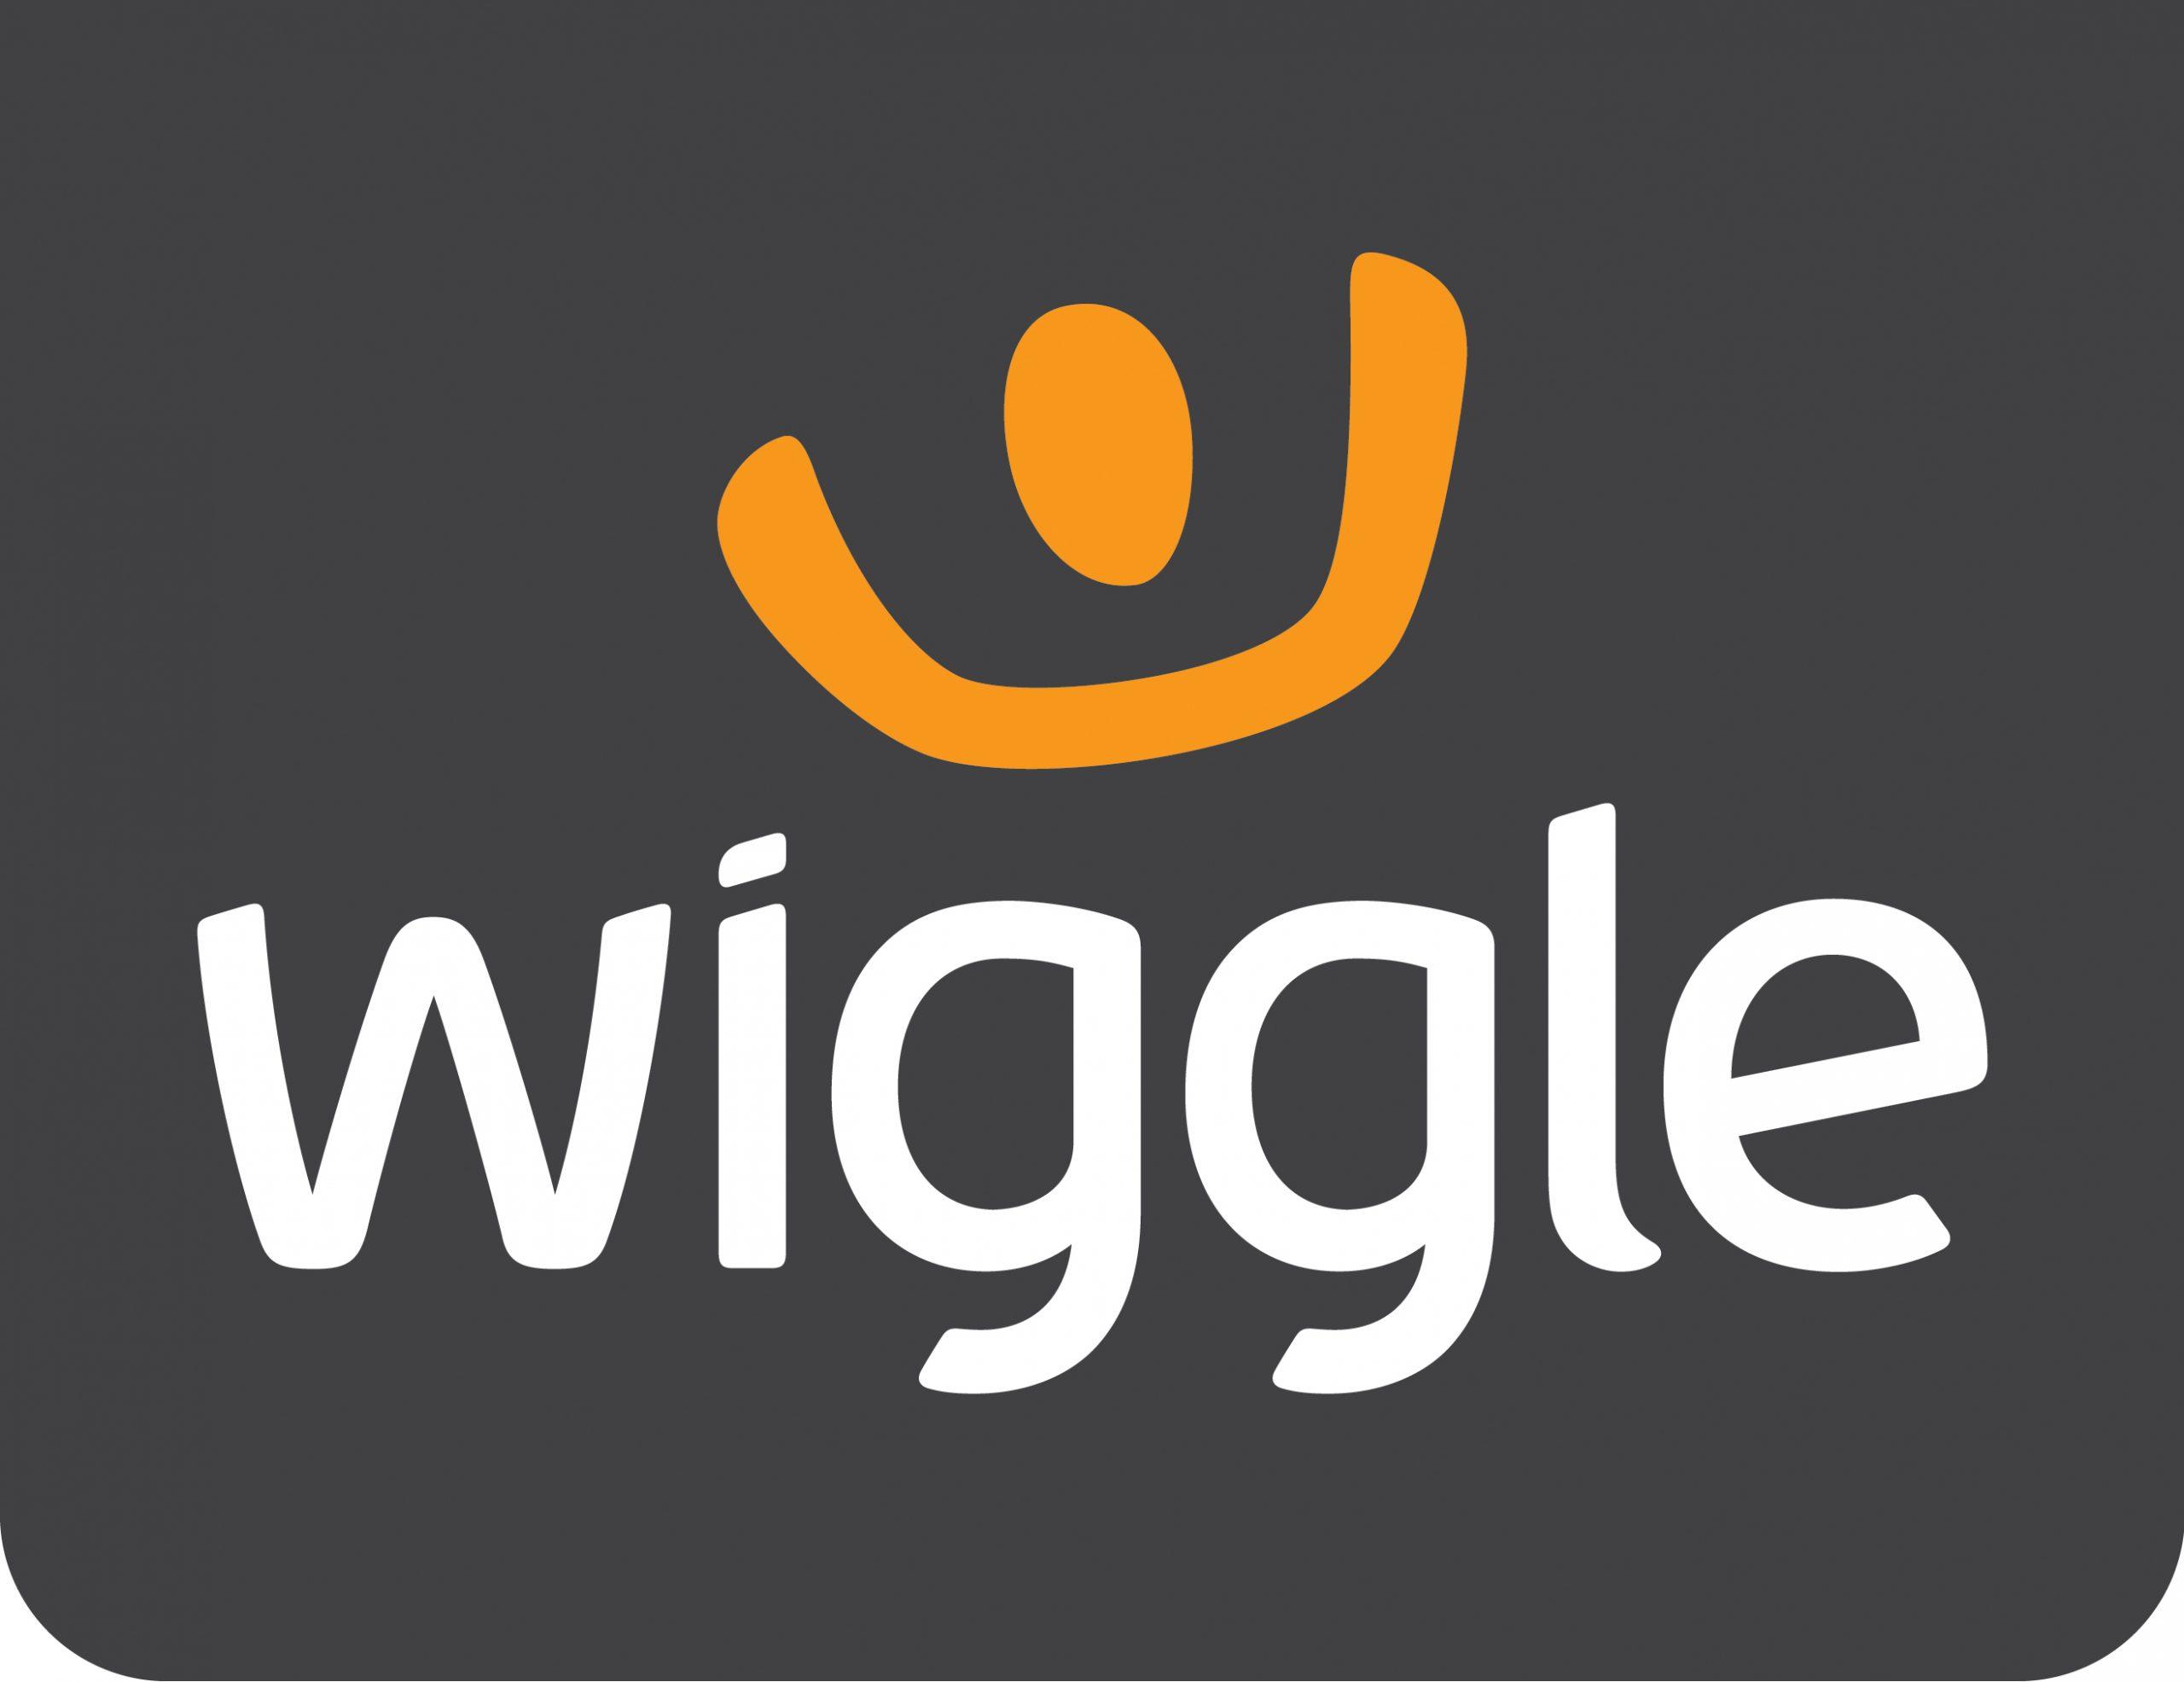 Wiggle's PUDO widget